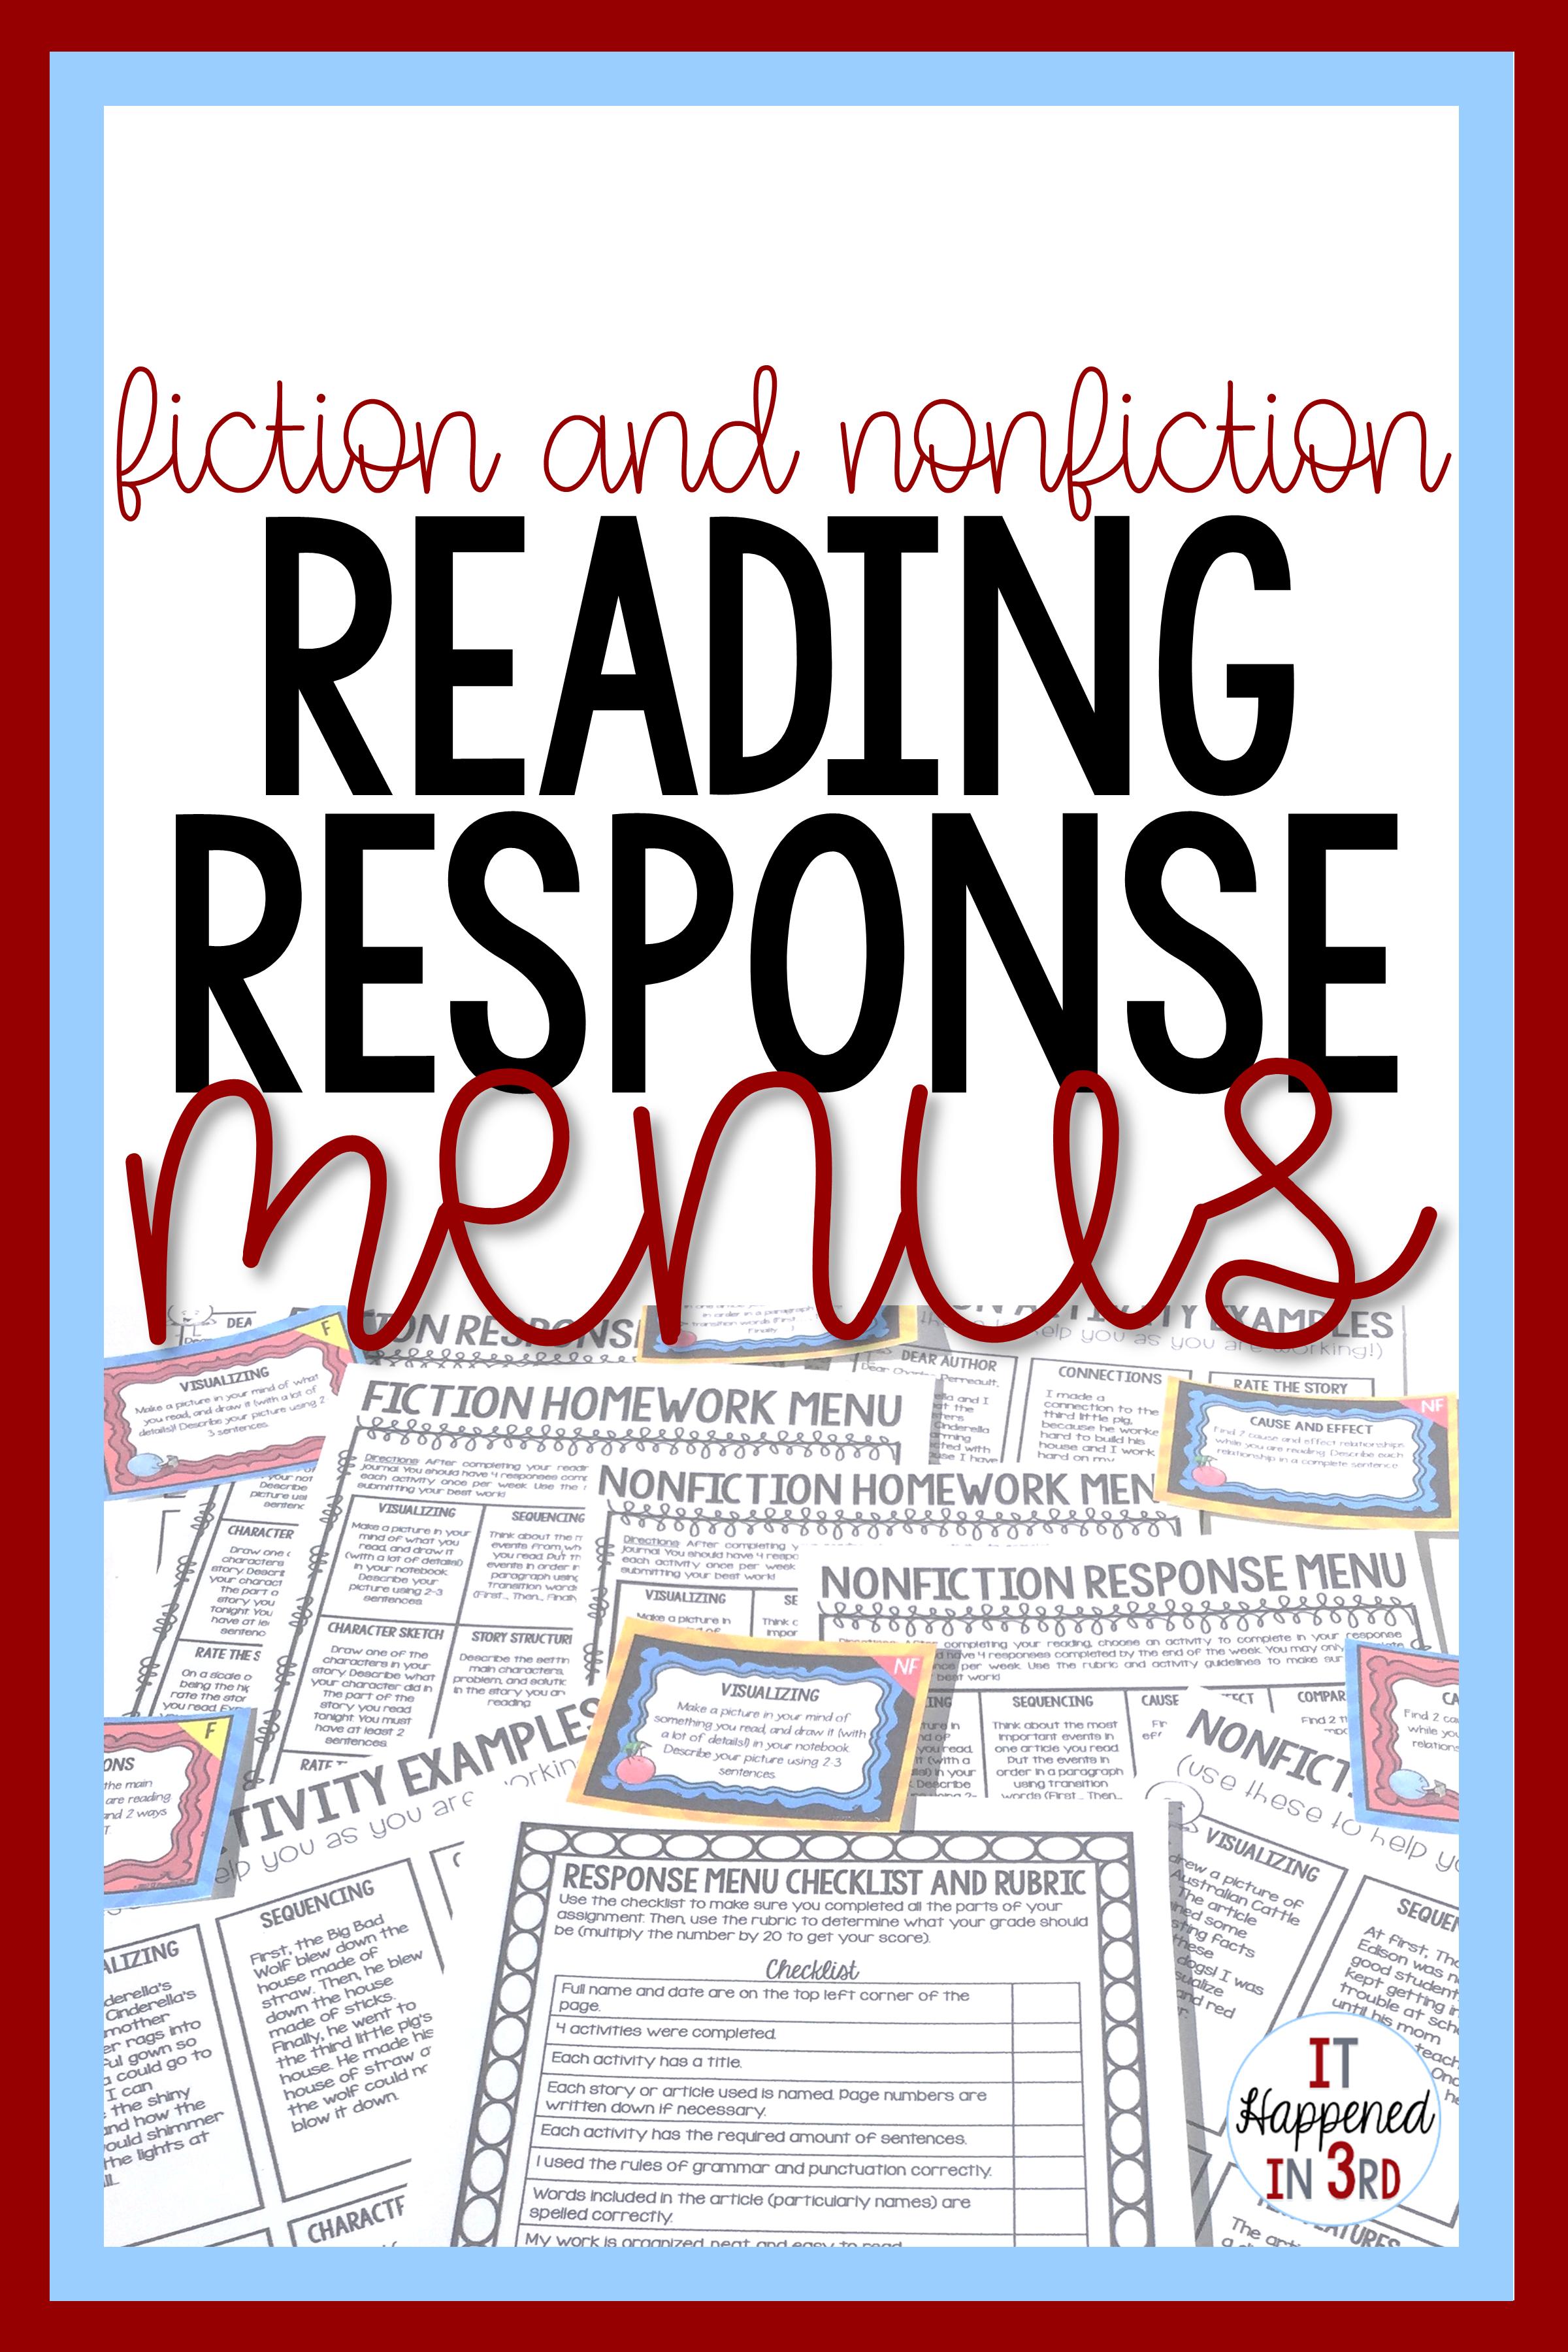 editable fiction and nonfiction reading response menus it happened